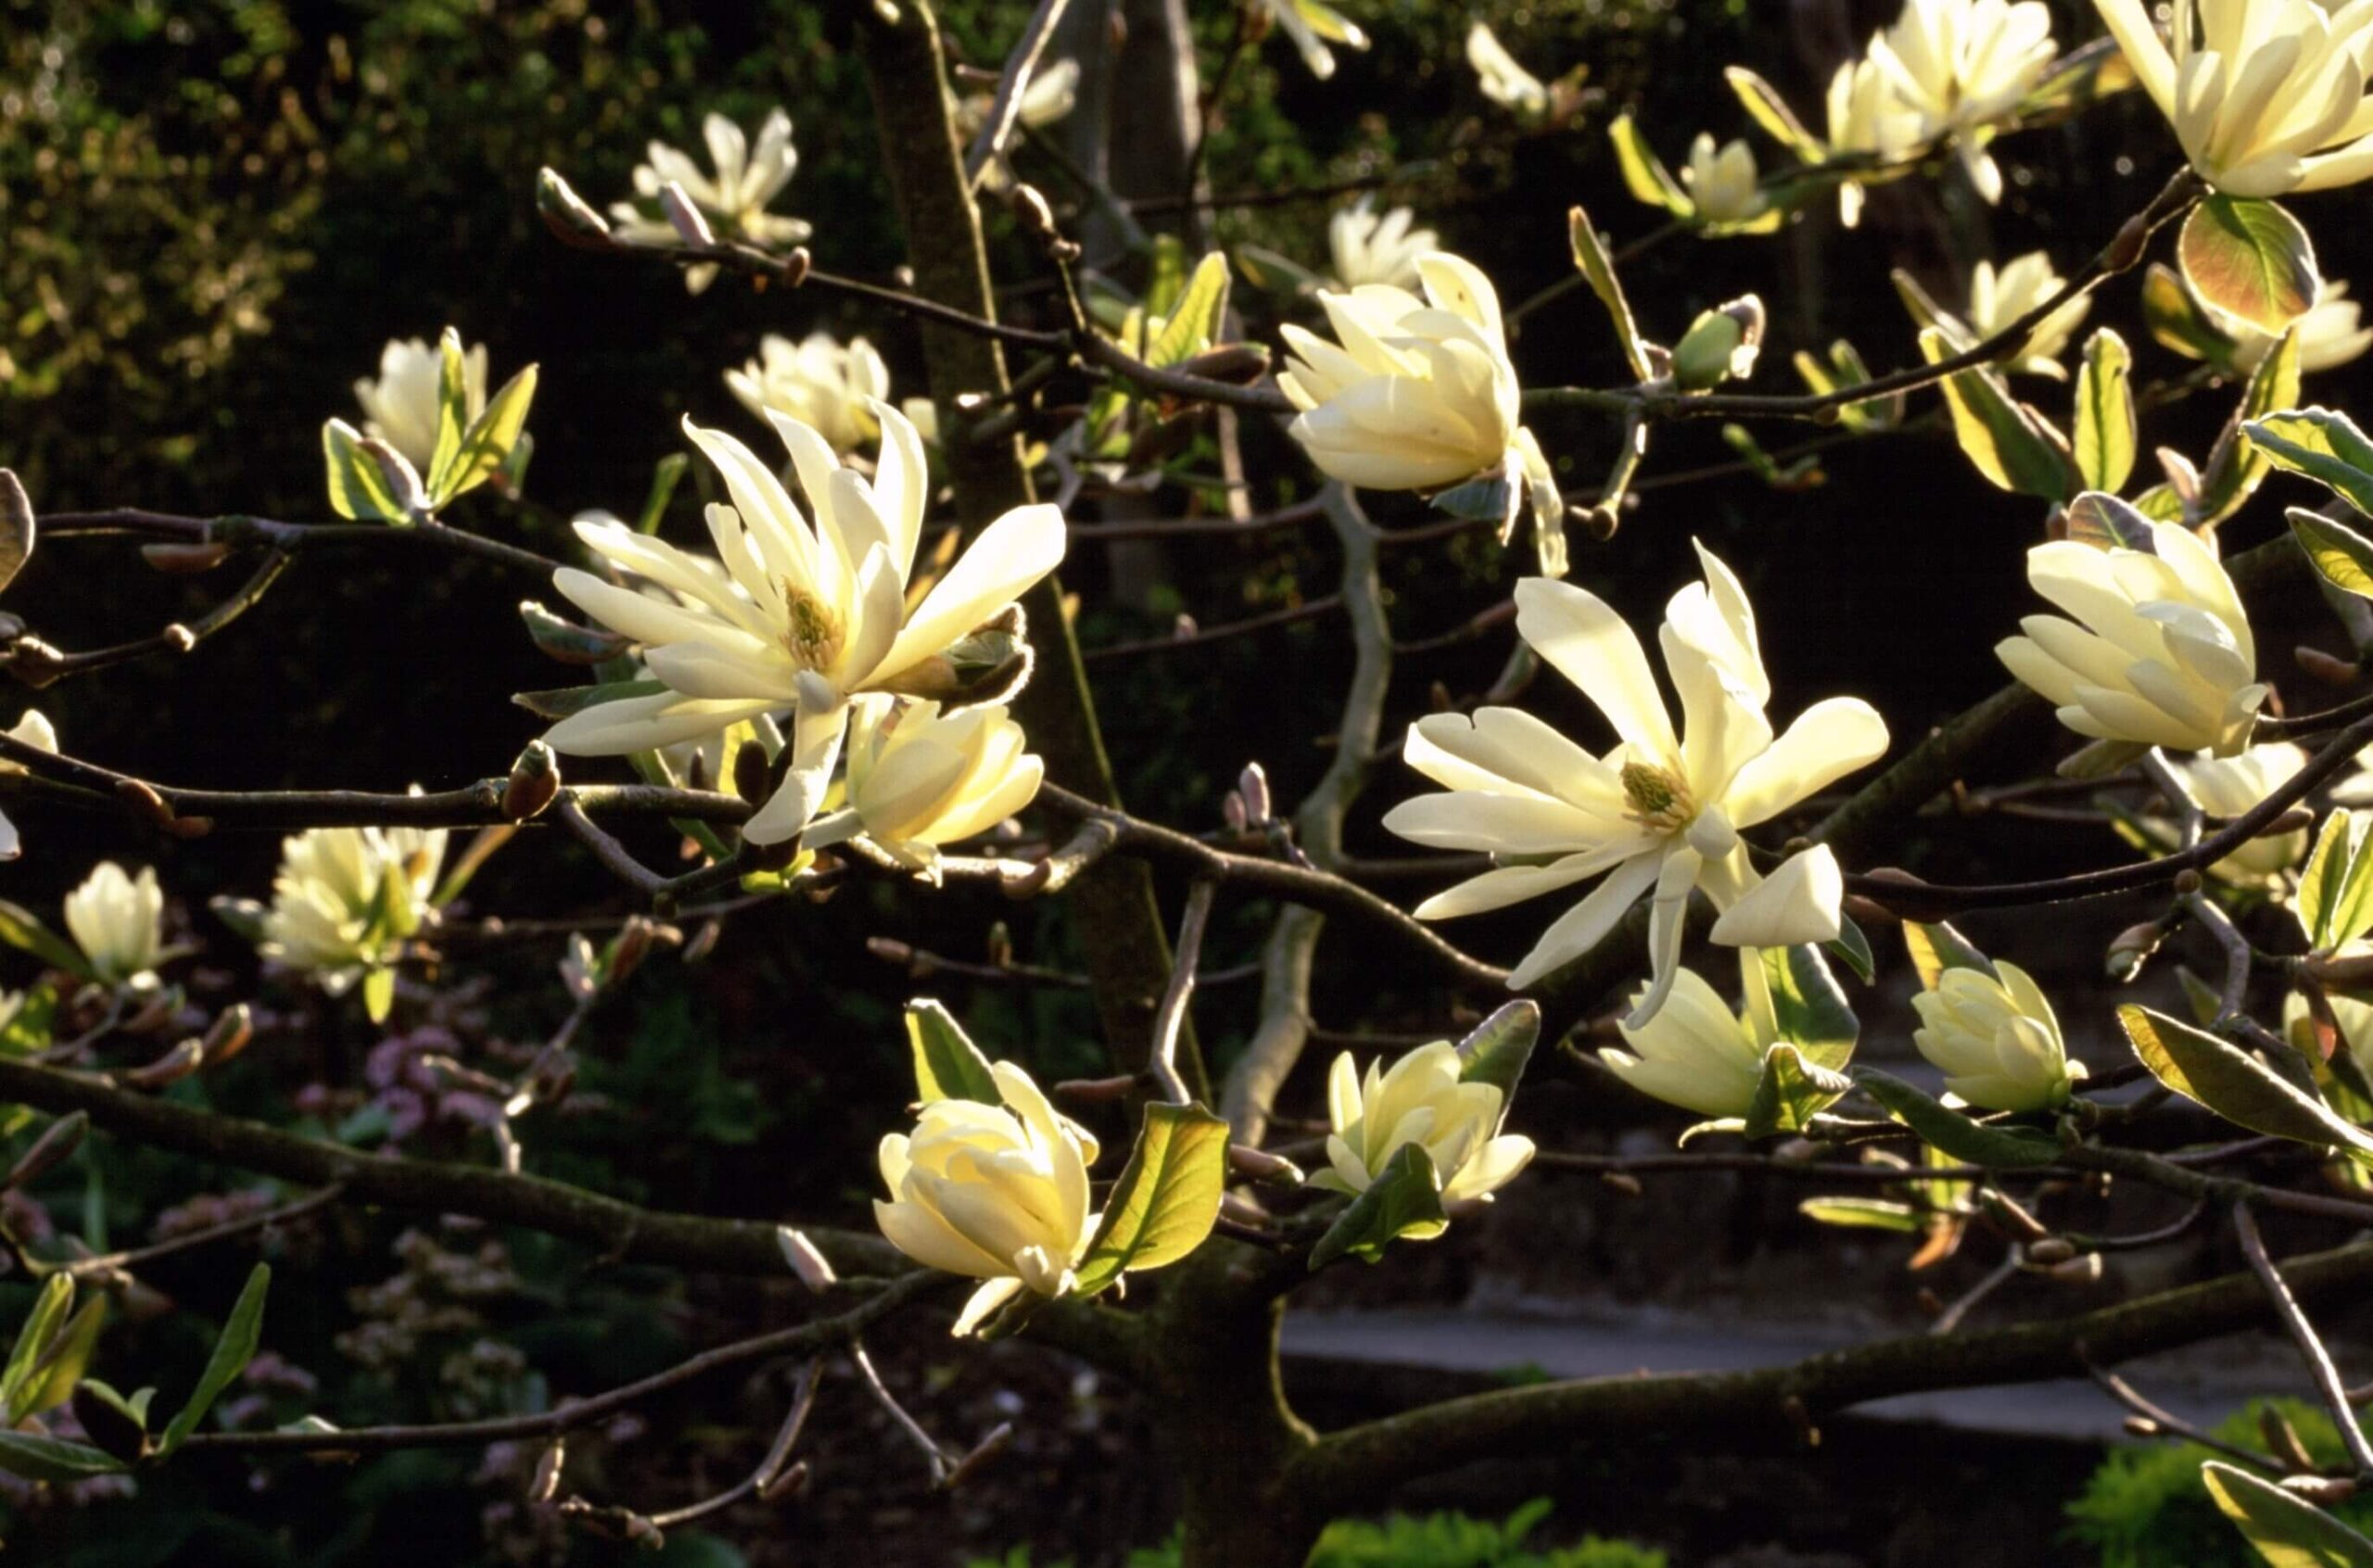 Golden yellow Magnolia 'Goldstar' in flower at Aberglasney Gardens